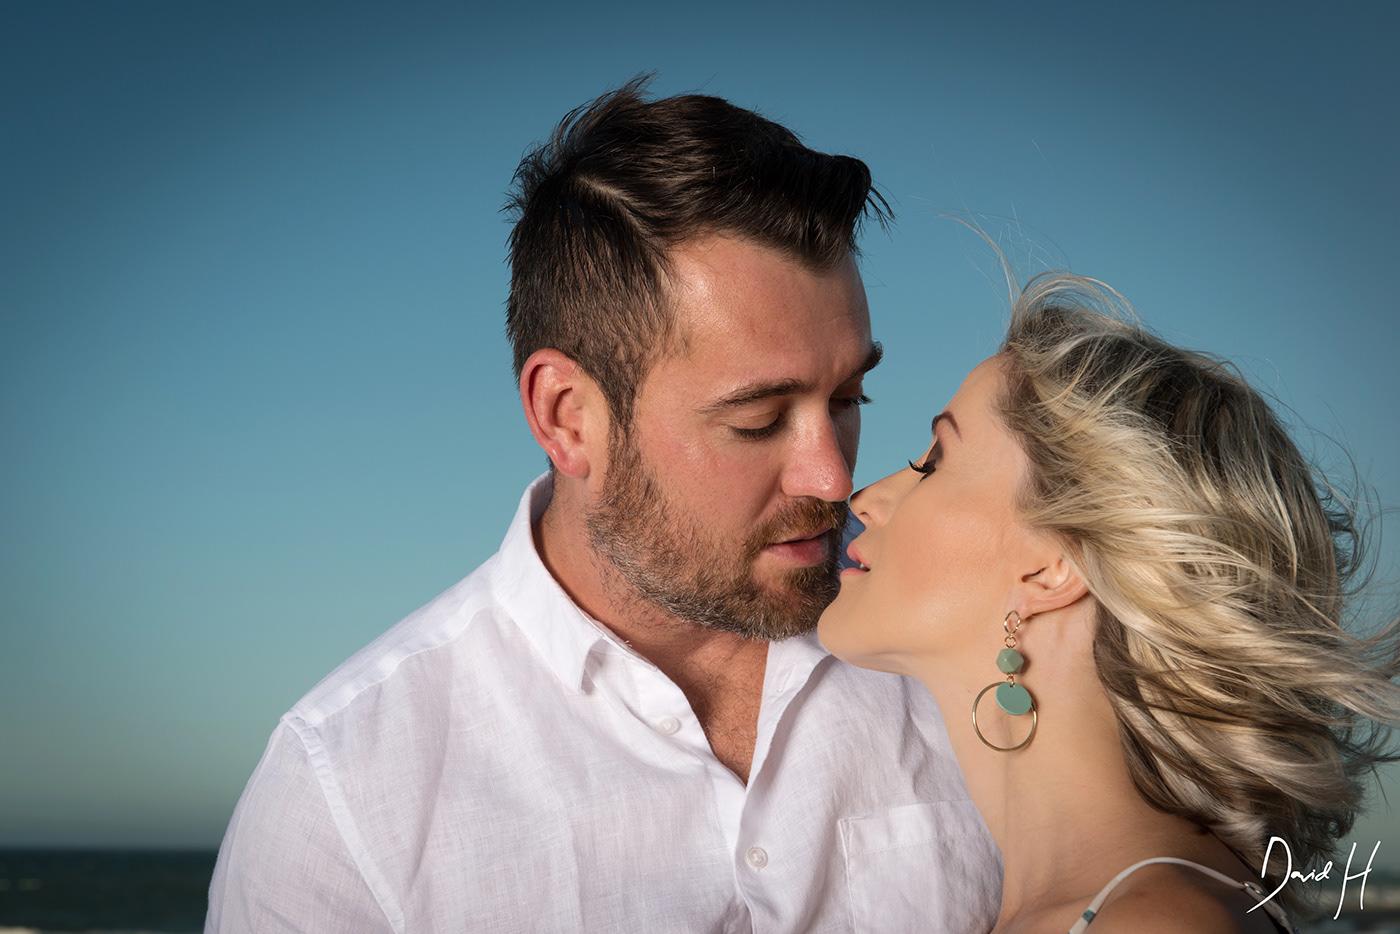 Image may contain: person, kiss and man